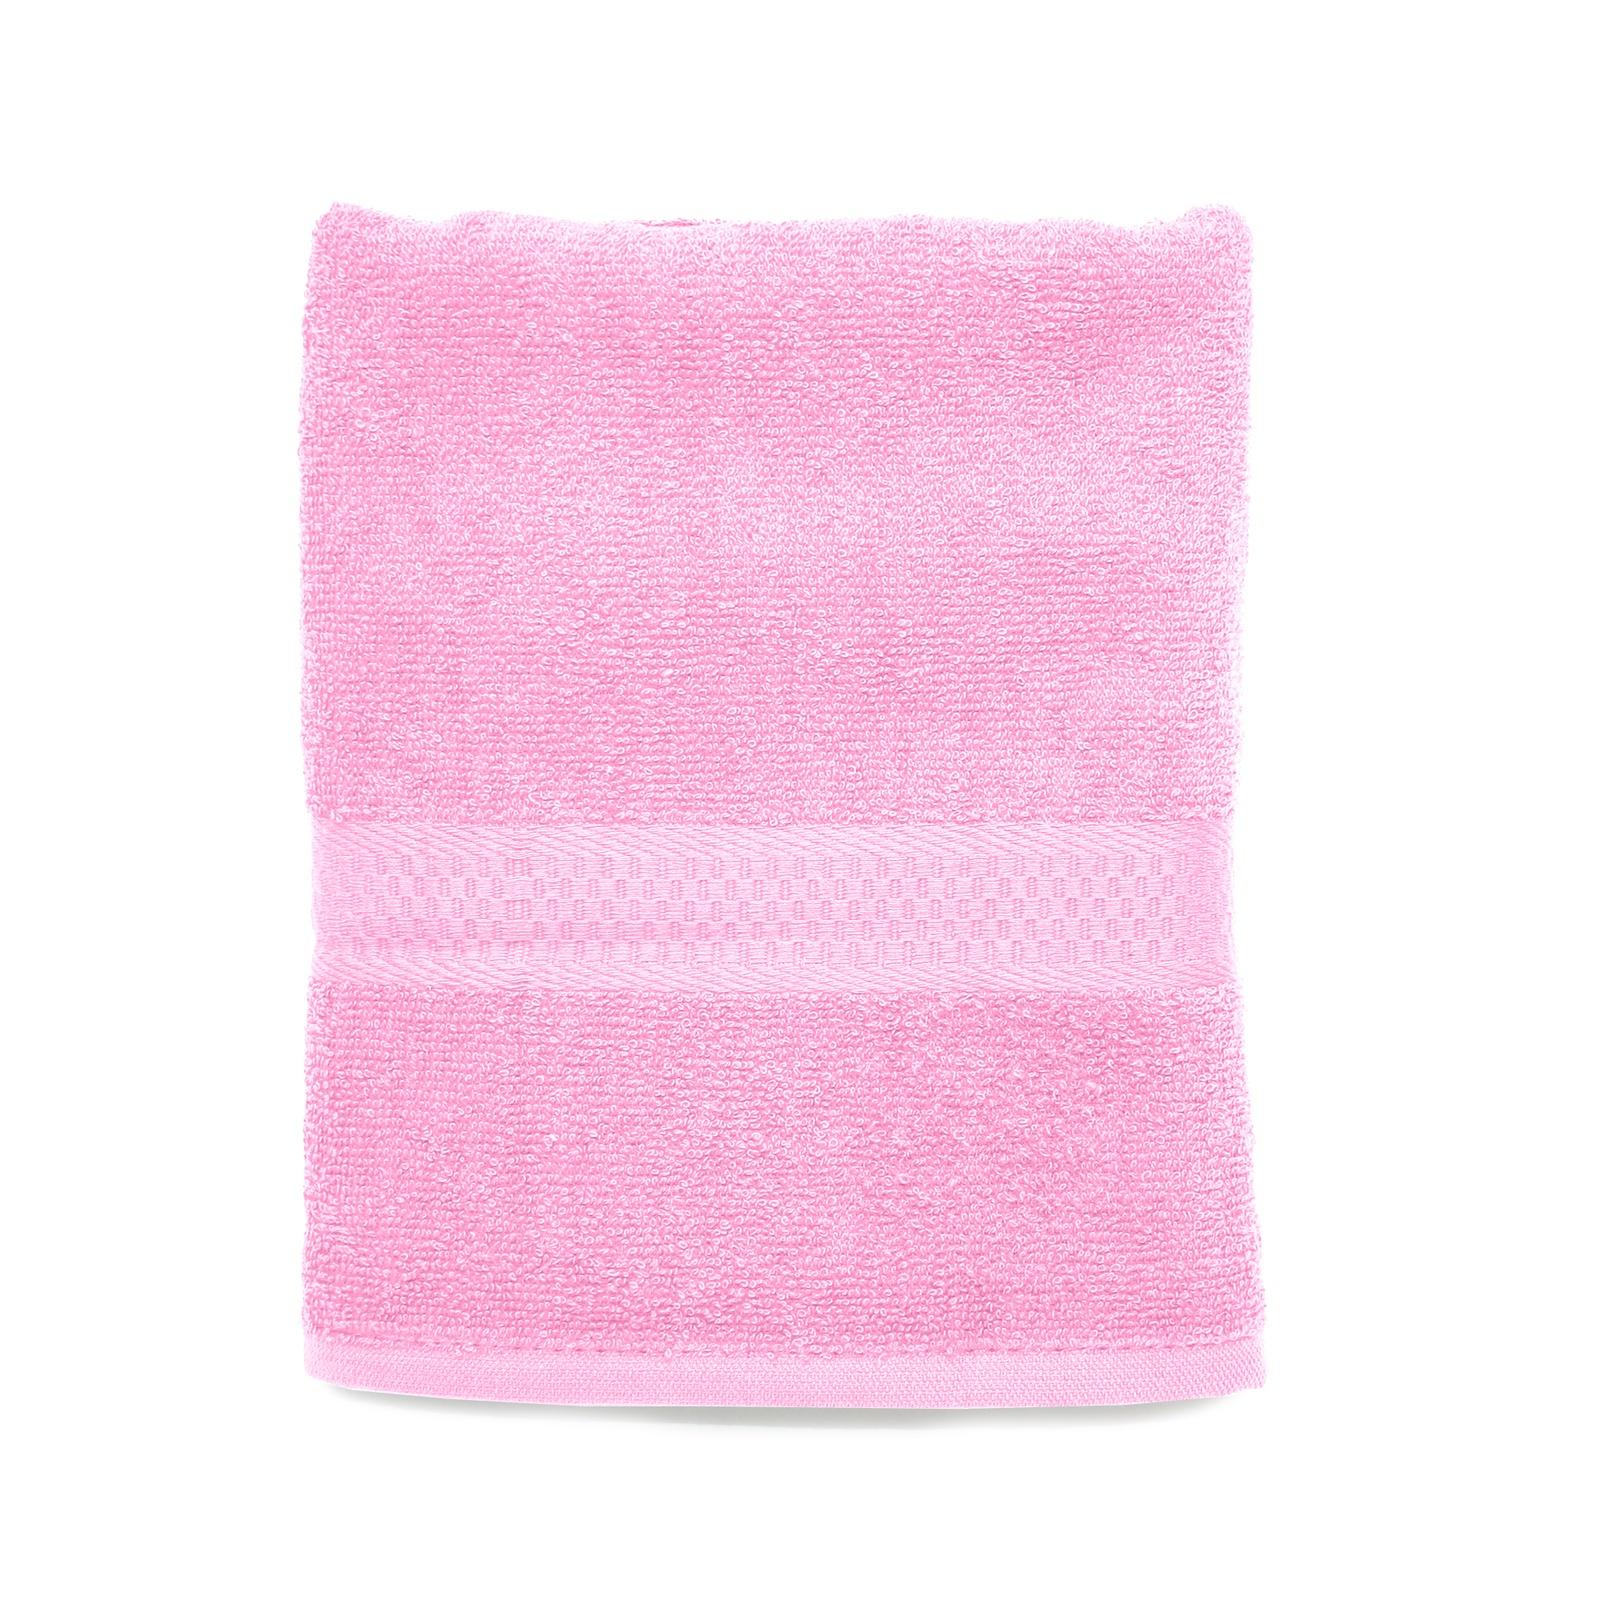 Полотенце банное Spany, 21311318182, махровое, розовый, 50 х 90 см полотенце банное fiesta arabesca 50 90 см